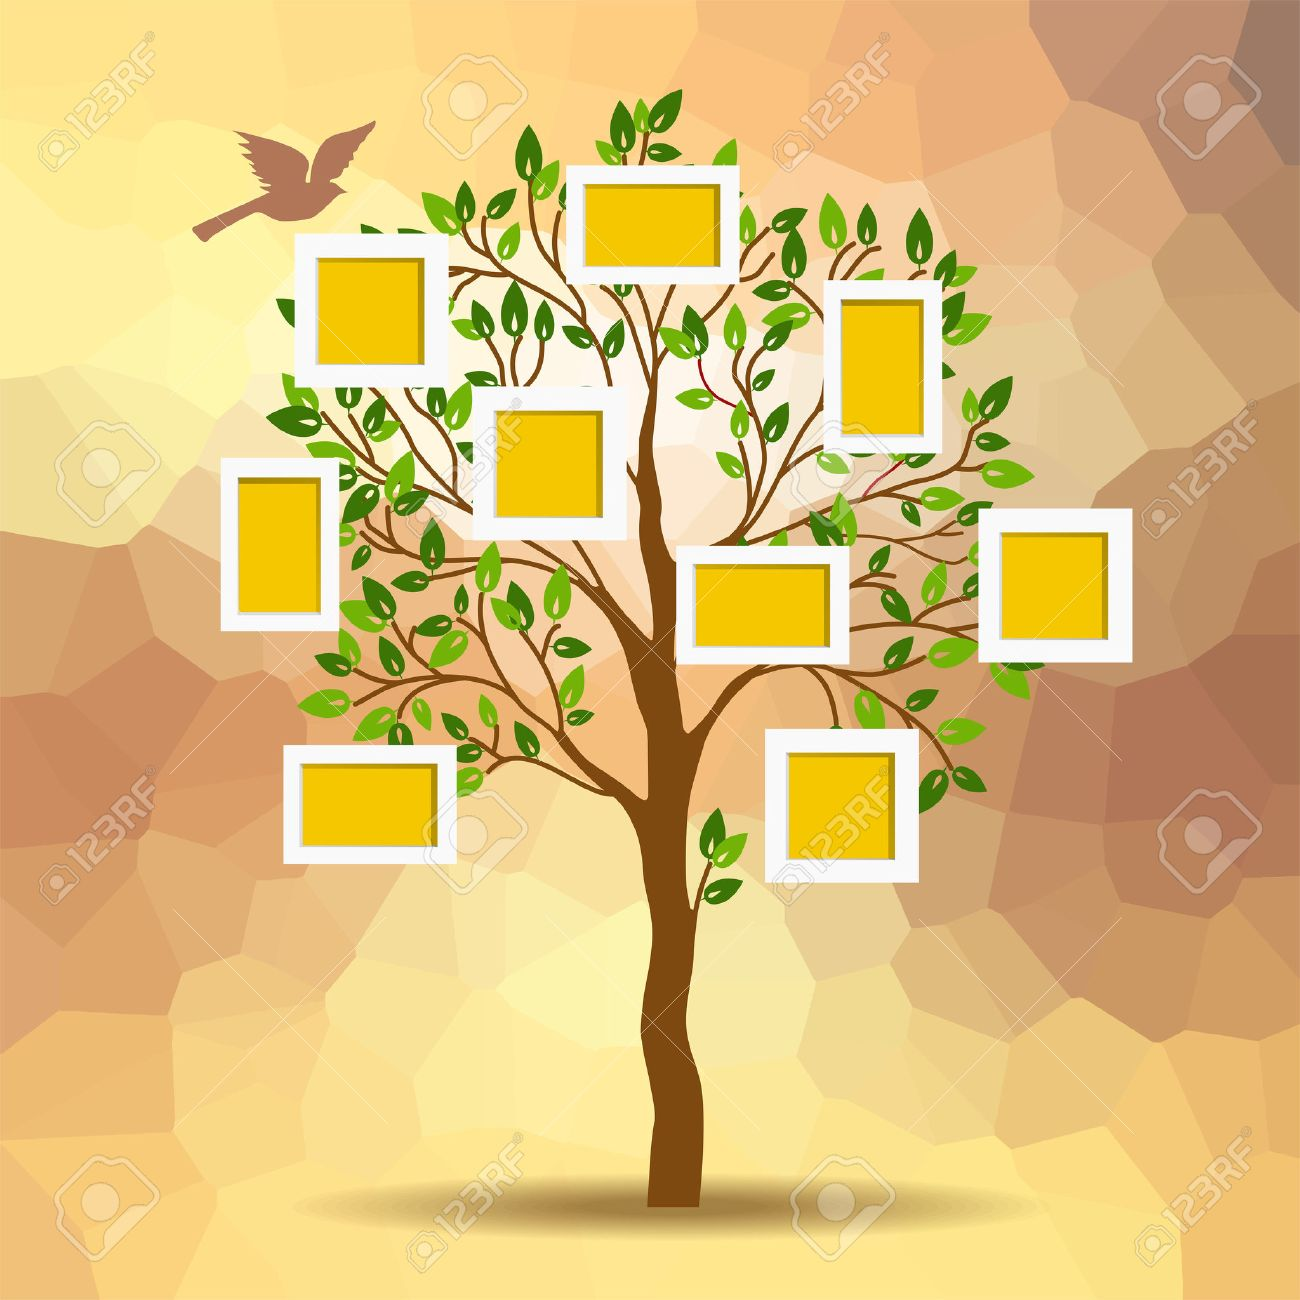 Family Tree Design, Insert Photos Into Frames Royalty Free ...